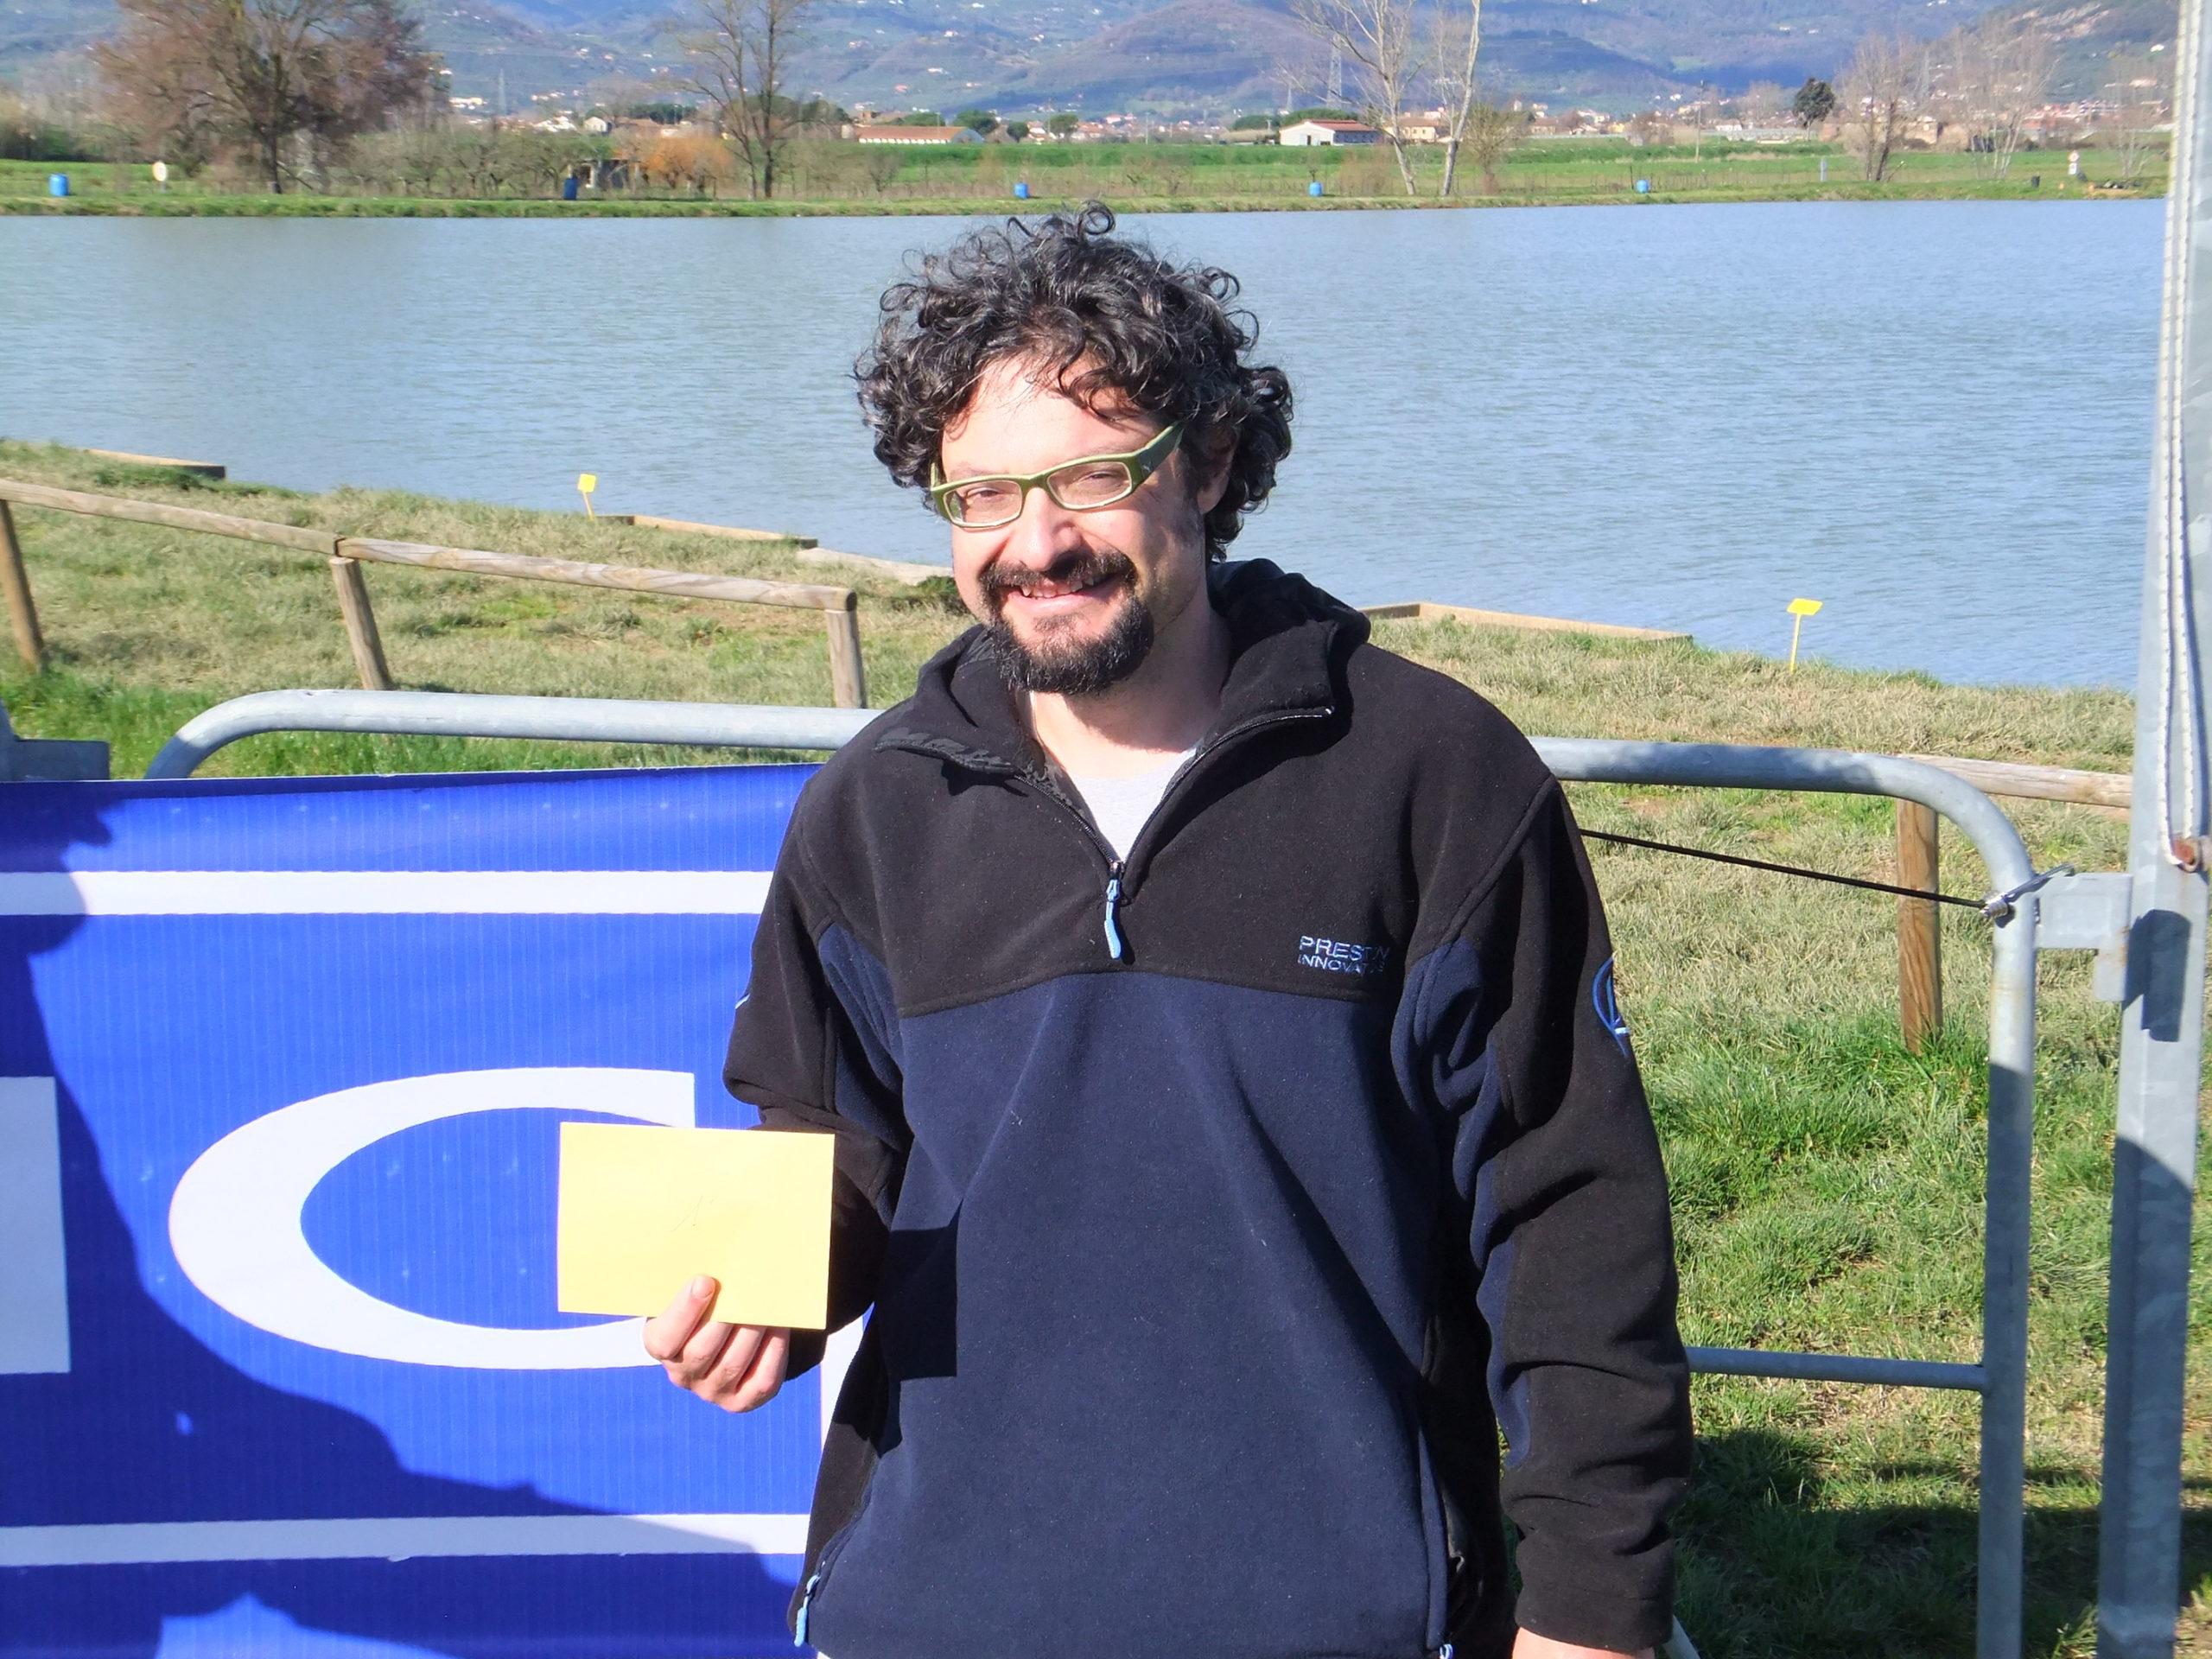 Andrea Canaccini